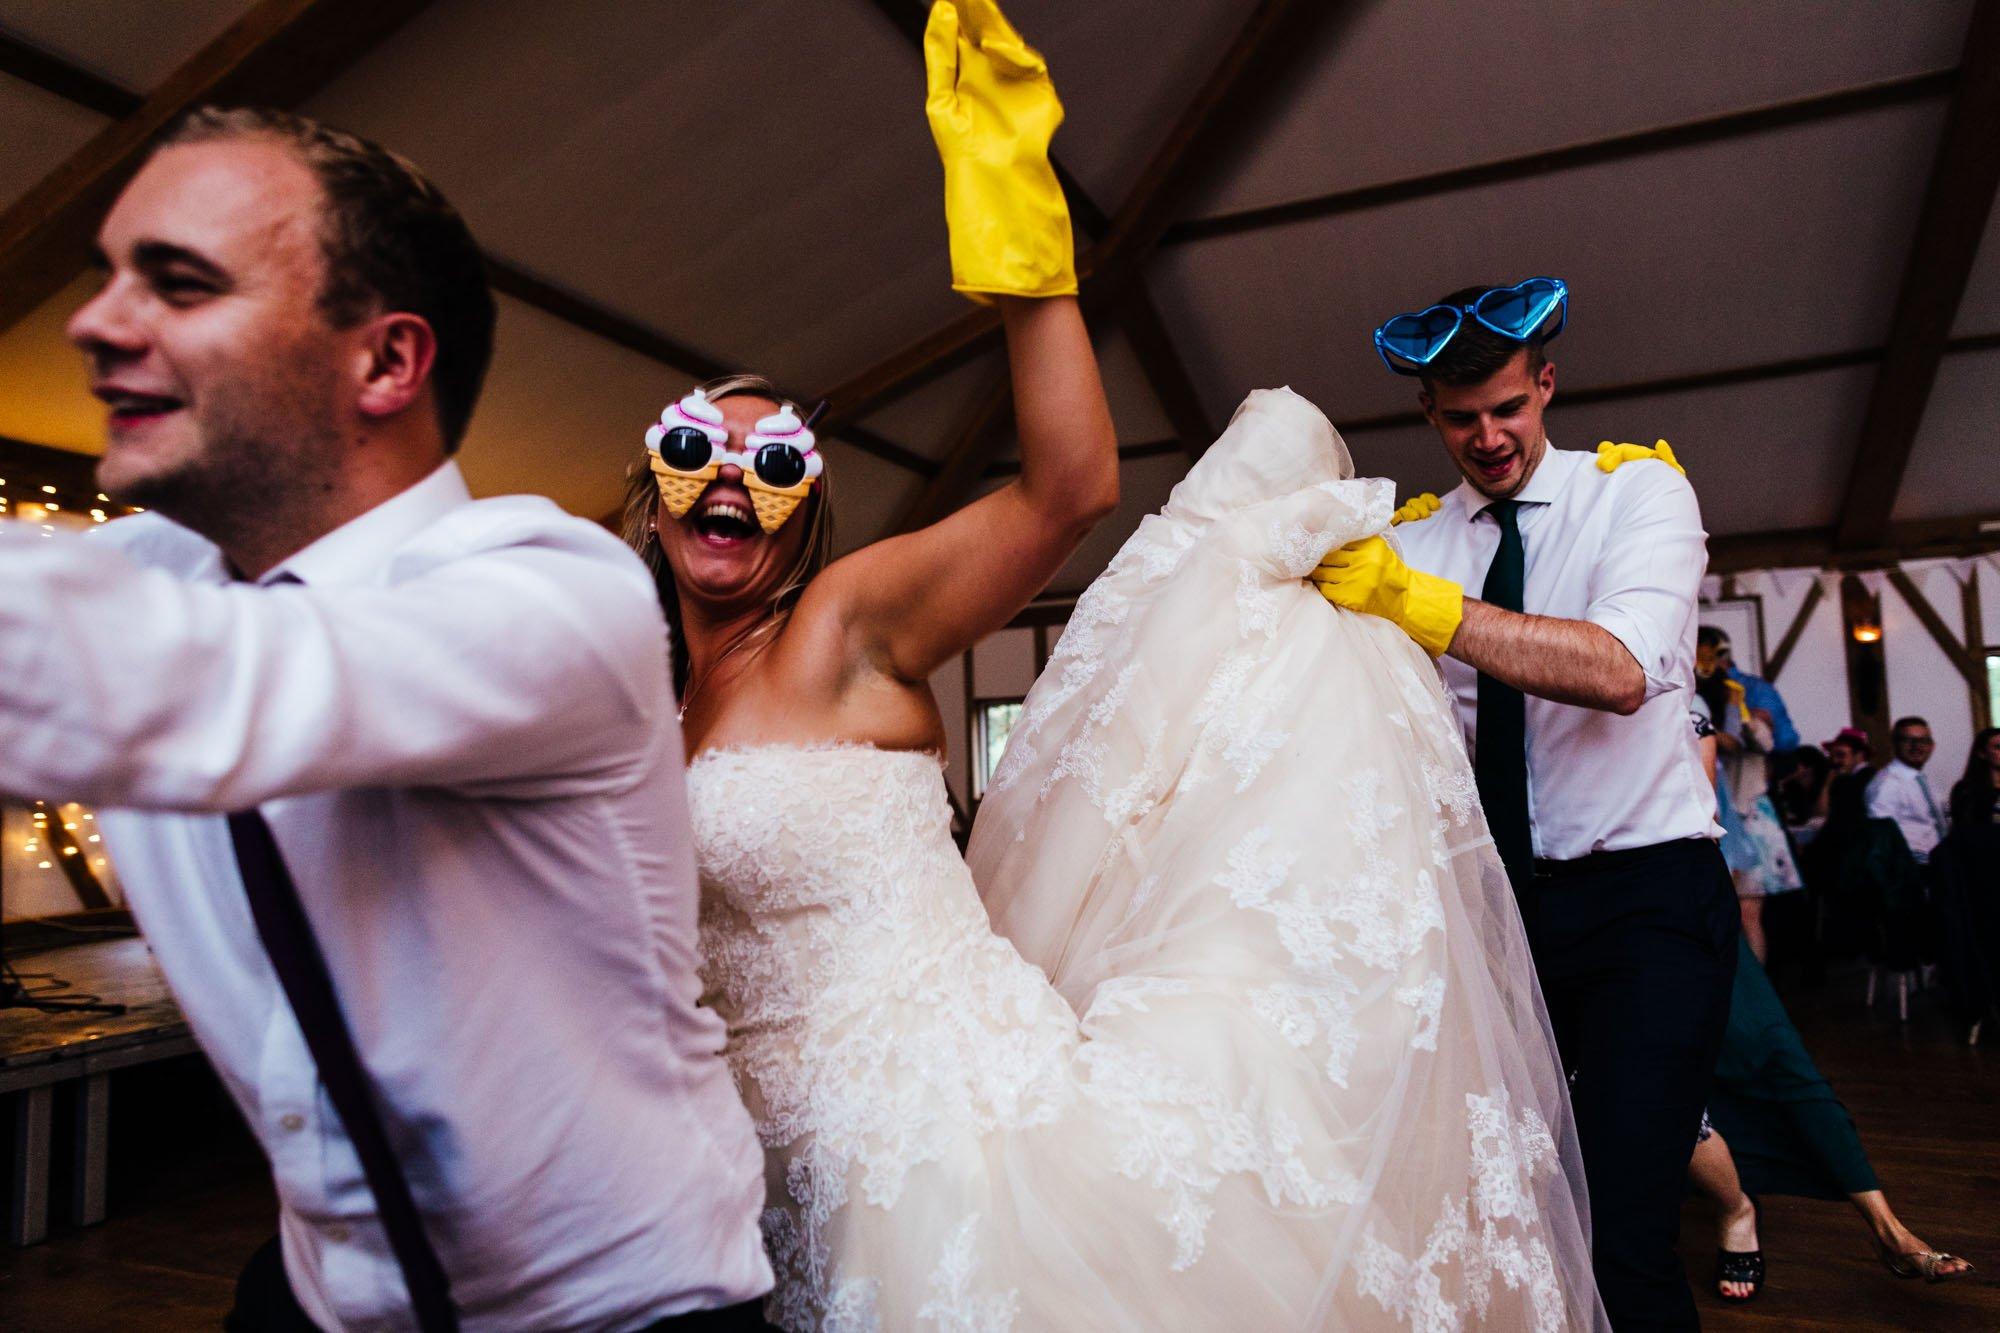 global-running-day-half-marathon-wedding-morning-8